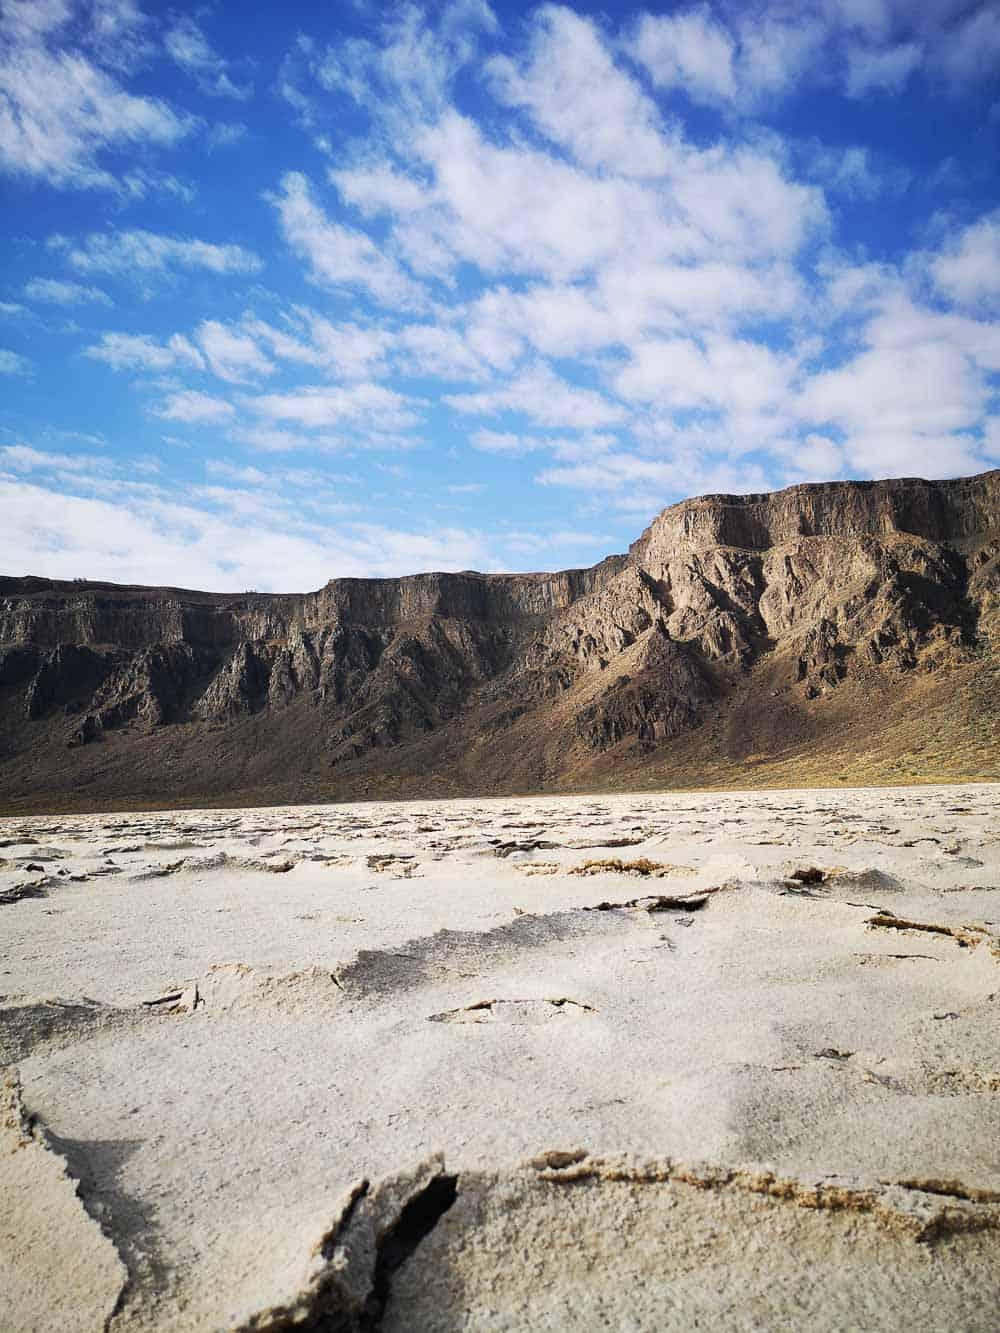 Inside Al Wahbah Crater